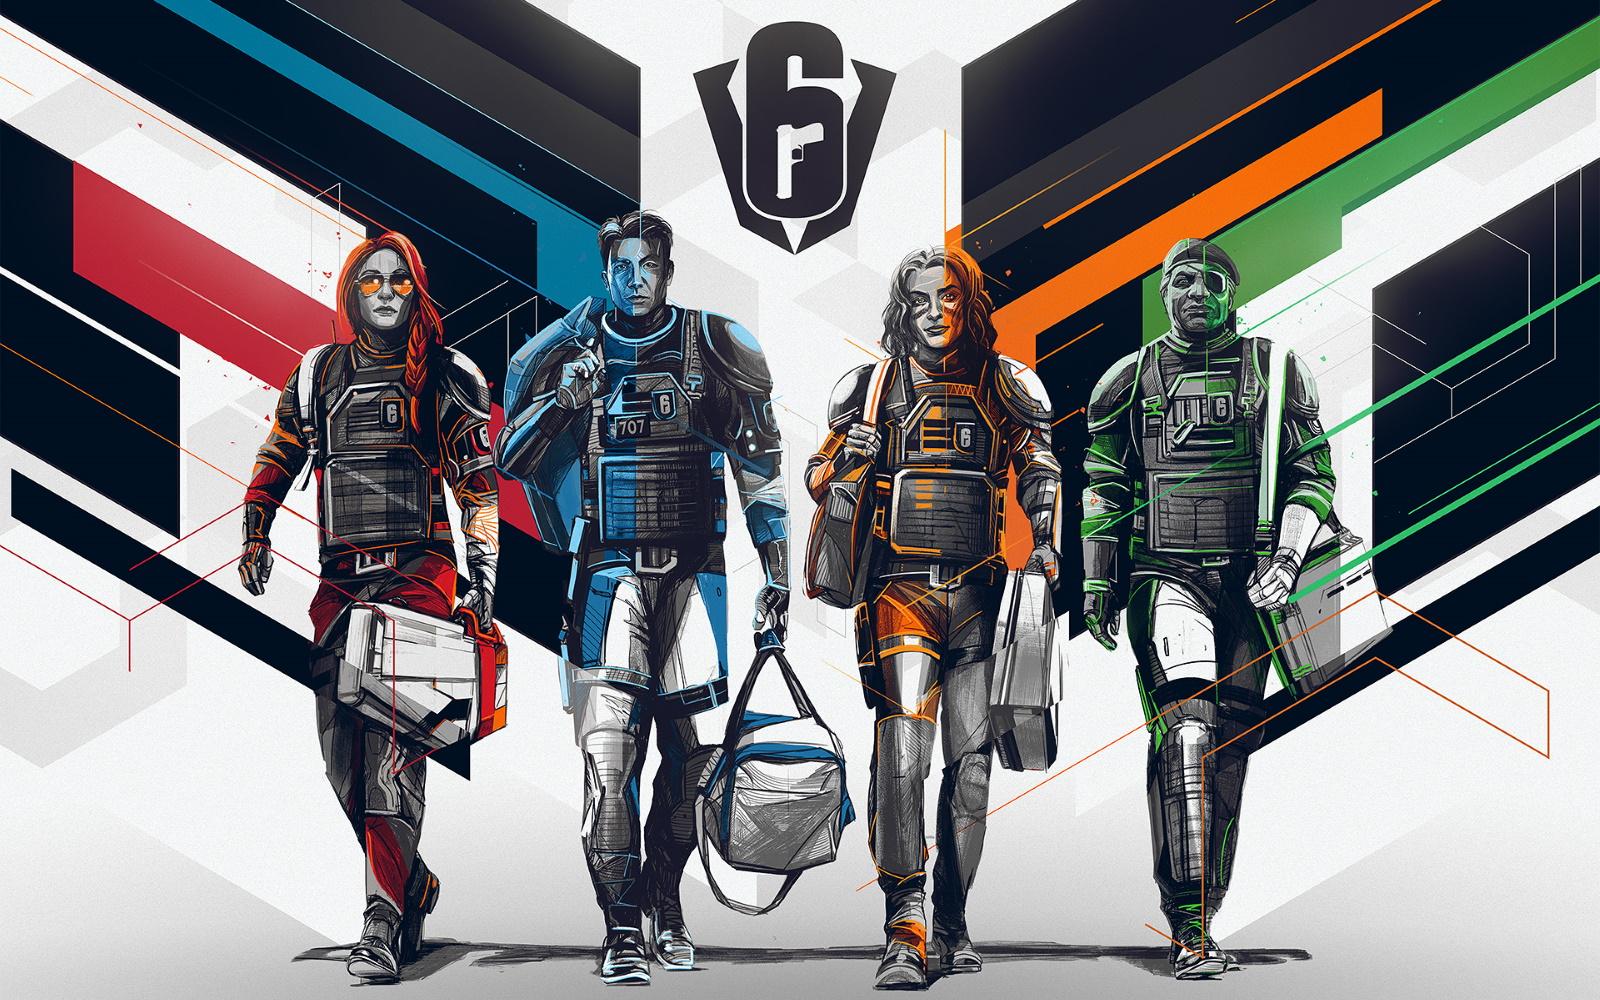 Ubisoft Announce Rainbow Six Siege eSports And Invitational Events